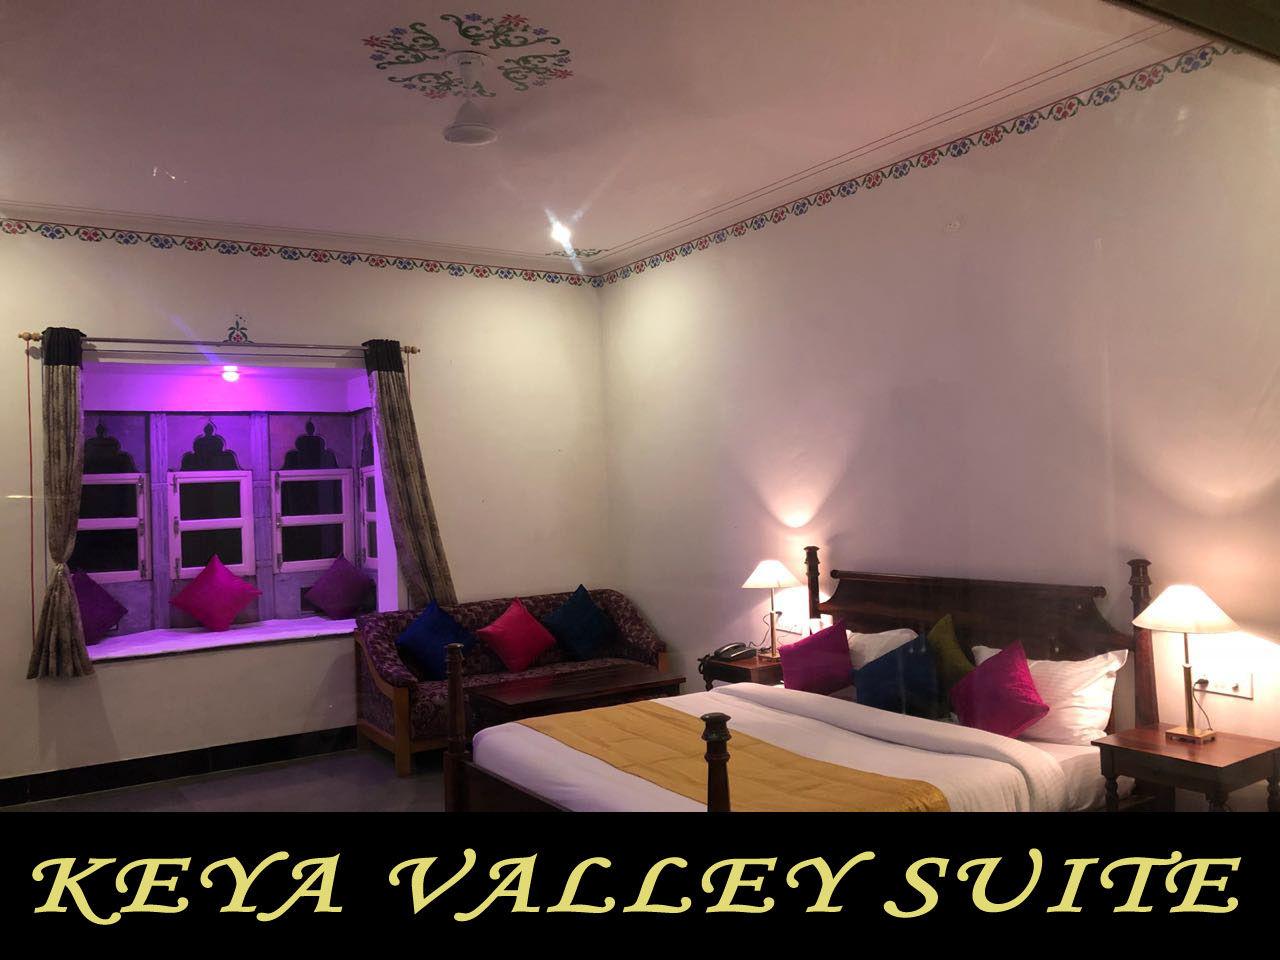 Find Resort in Kumbhalgarh | Kaya Valley Resort